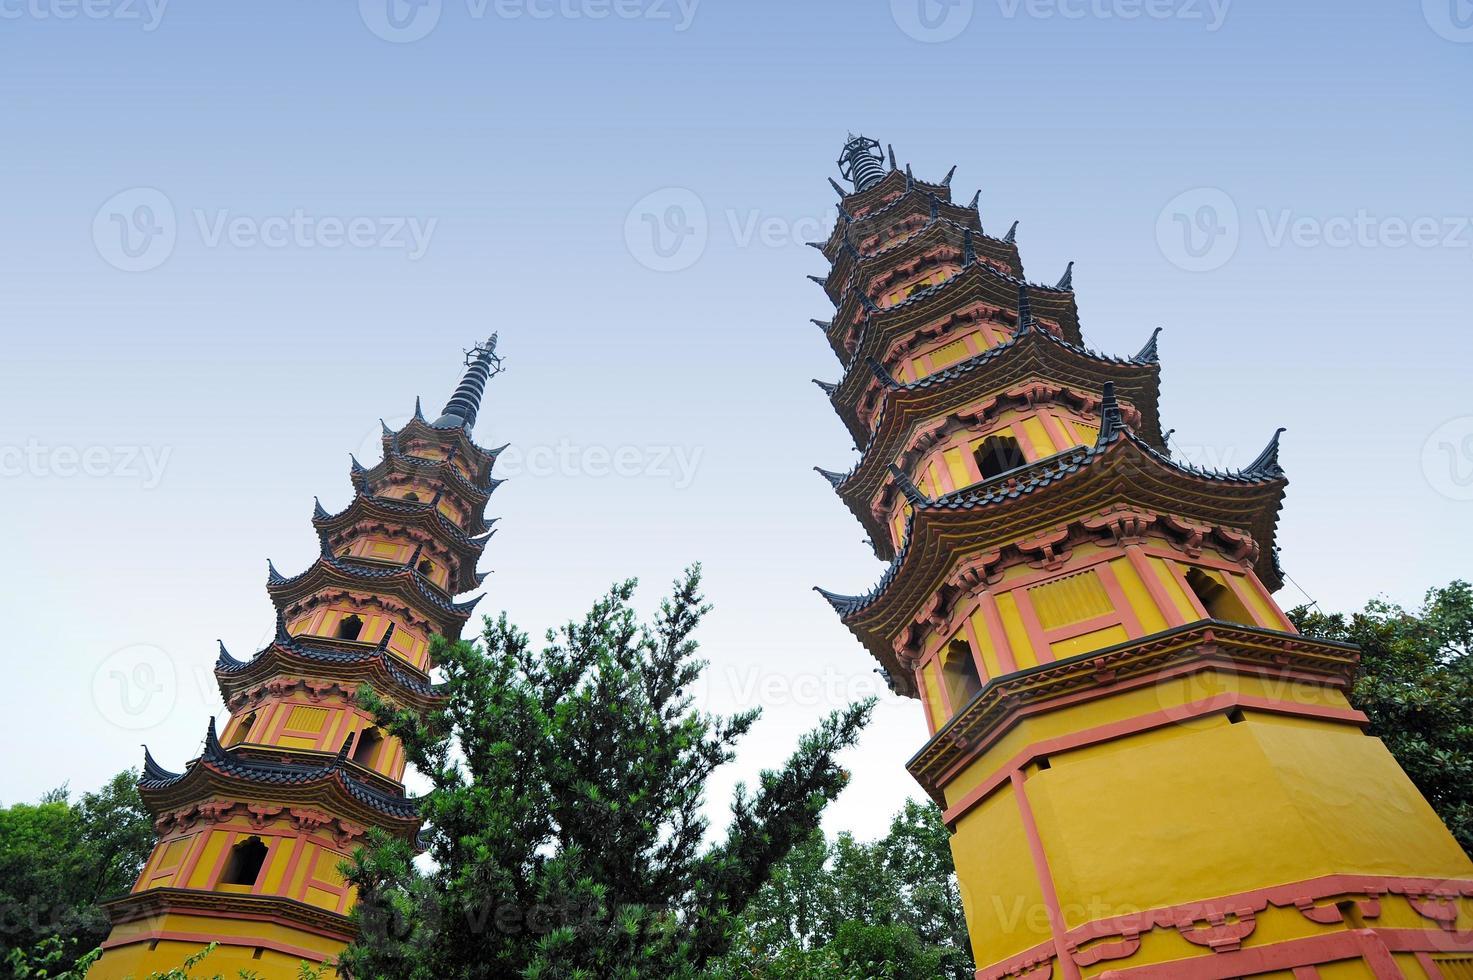 boeddhistische tweelingpagoden in suzhou - china foto